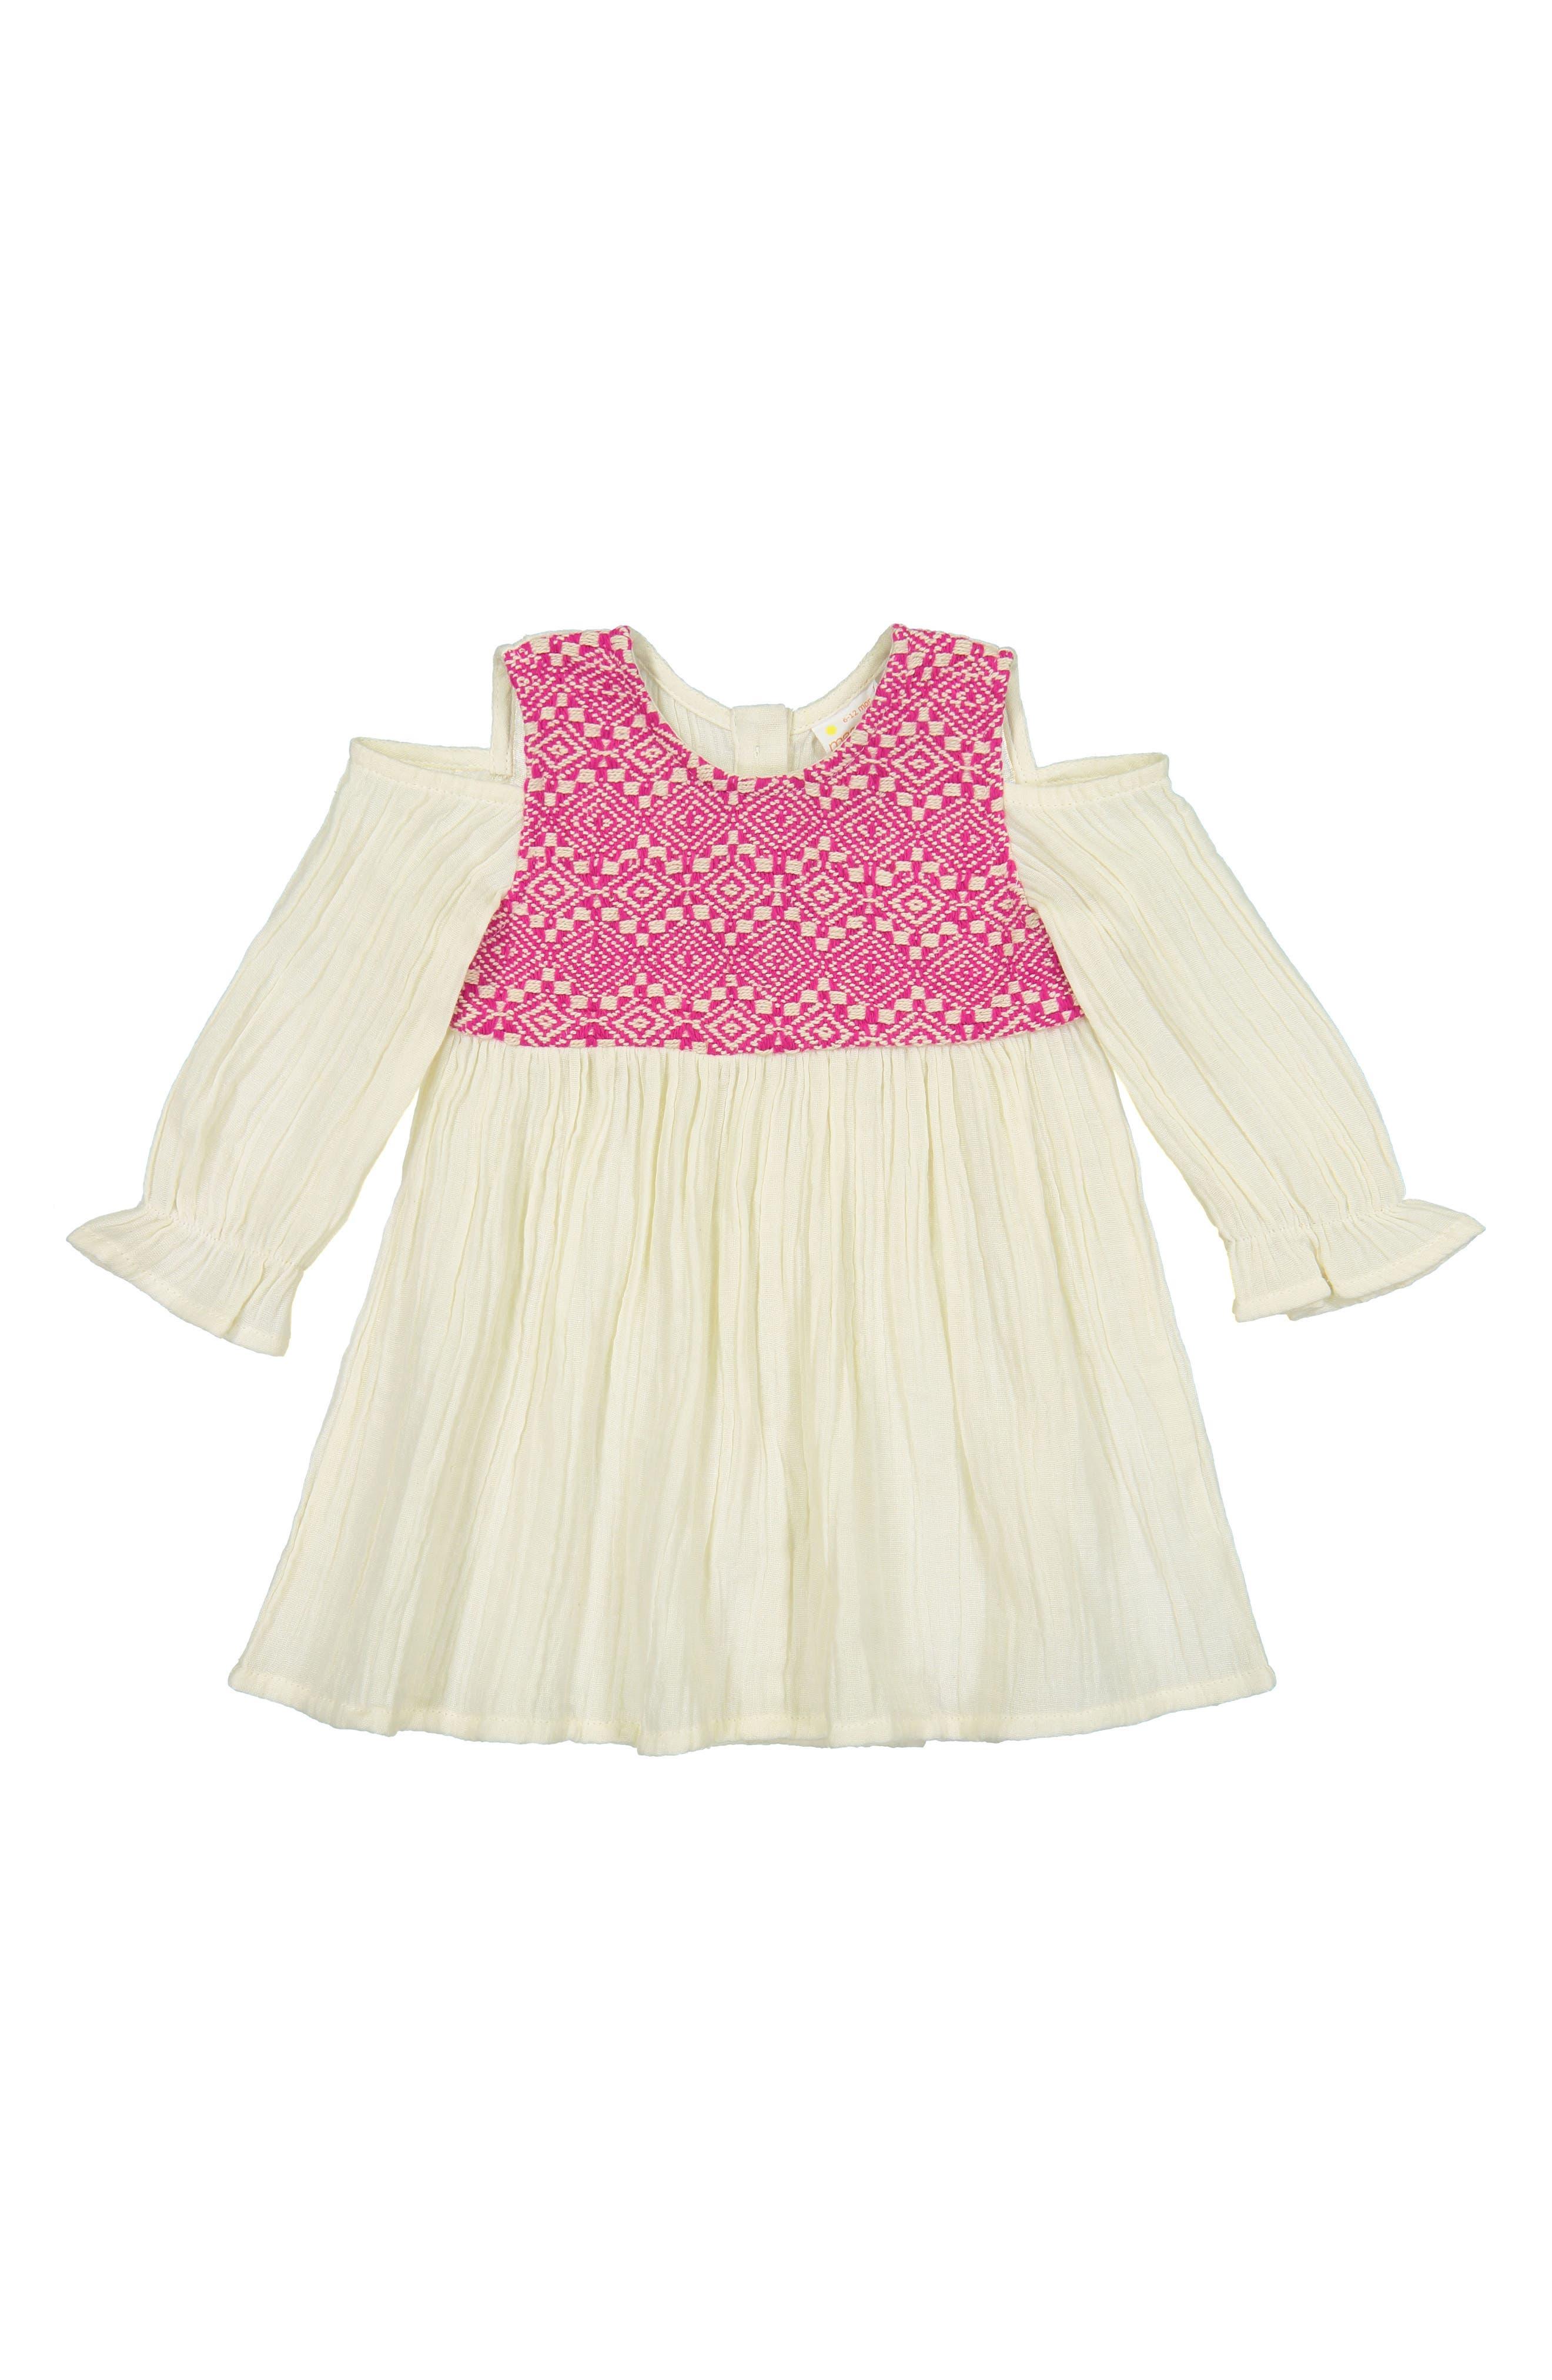 Layla Jacquard Cold Shoulder Dress,                             Main thumbnail 1, color,                             PINK